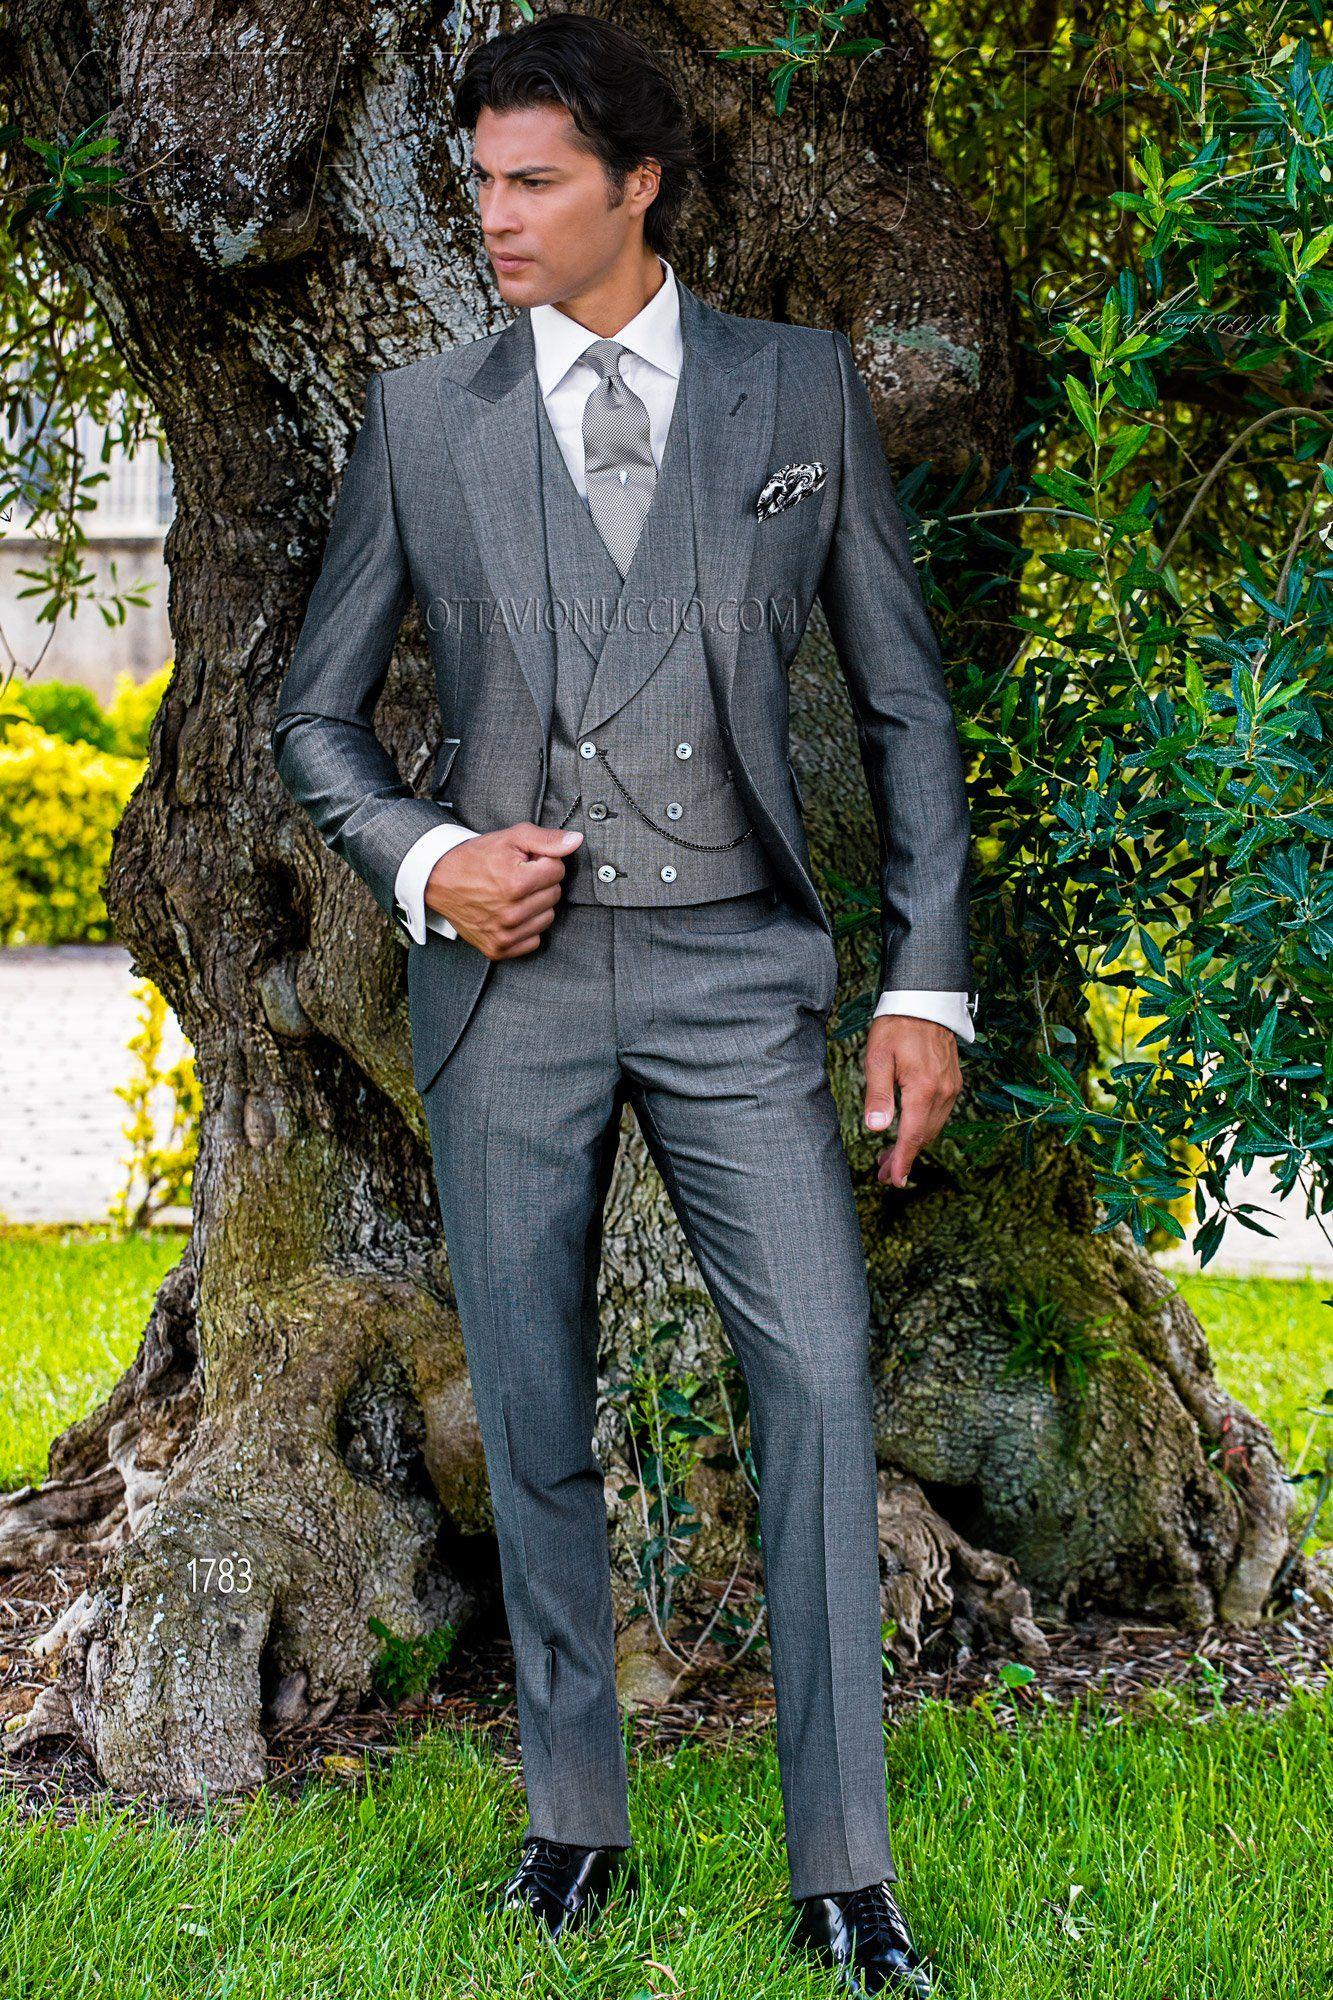 Sharkskin gray peak lapel wedding suit #grey #tuxedo #luxury ...